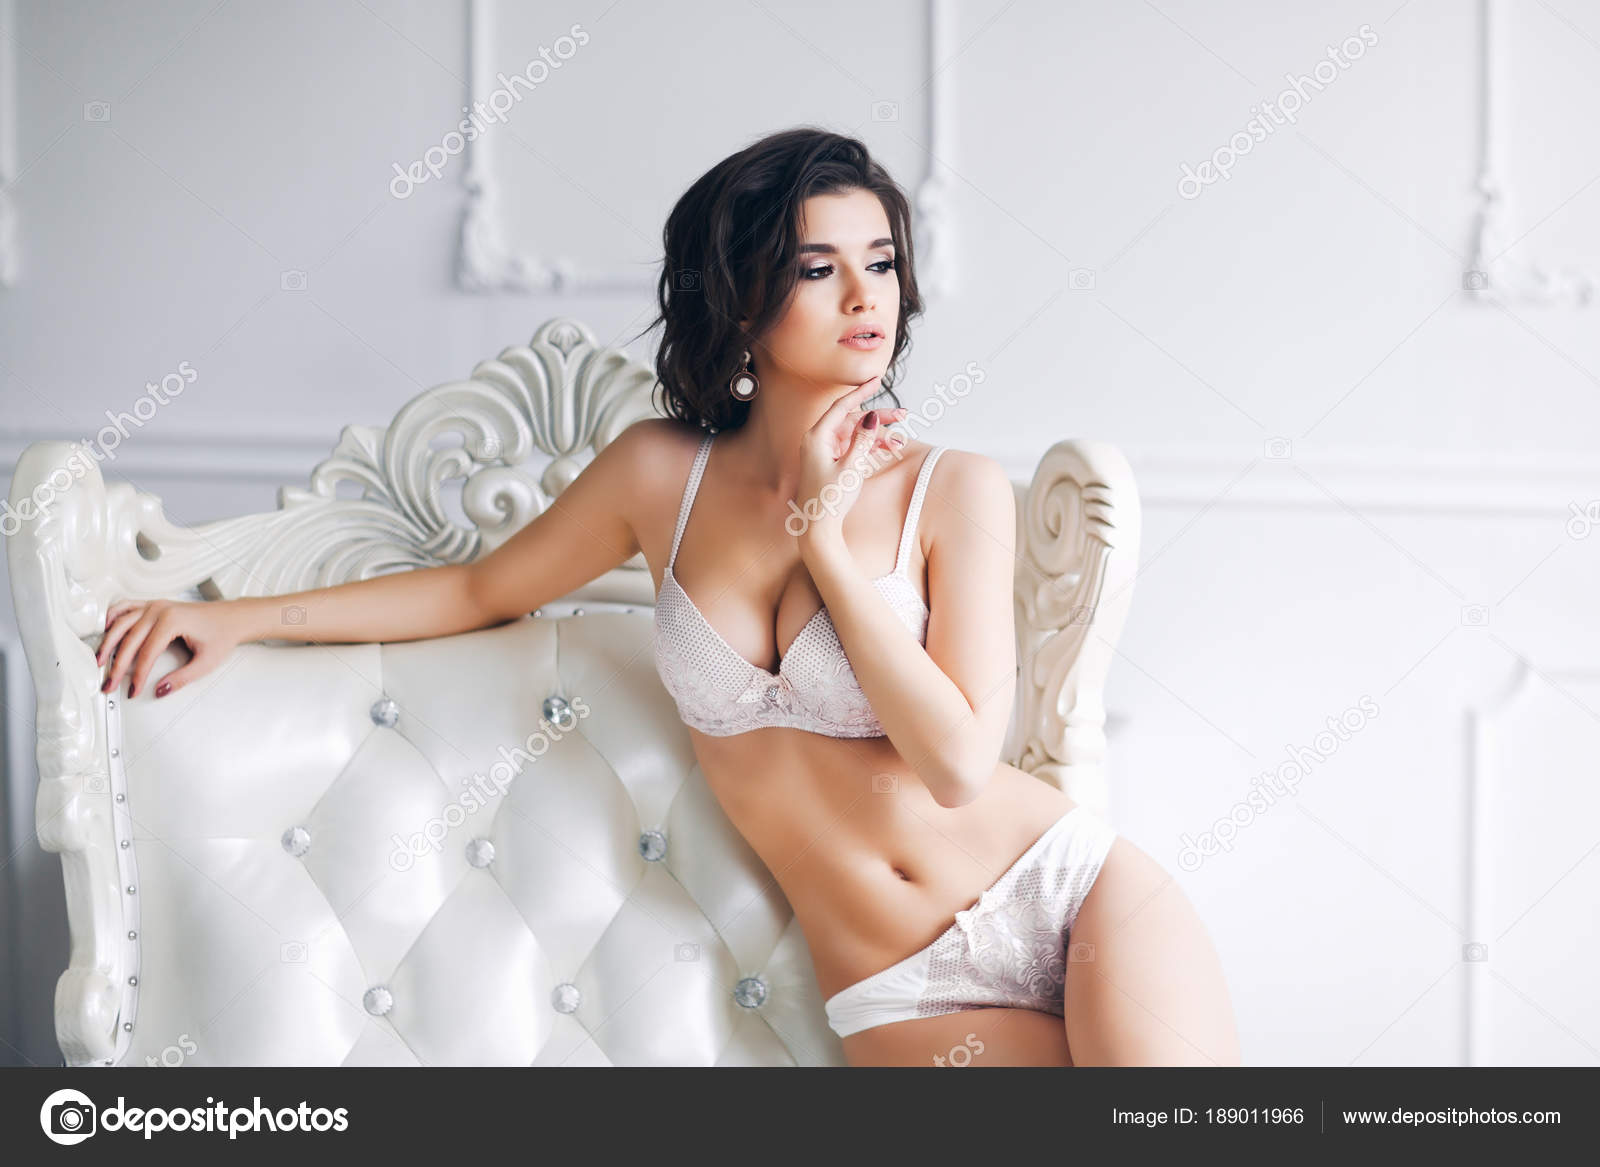 8b26c172cc5 Young Beautiful Woman Posing White Sexy Lingerie — Stock Photo ...